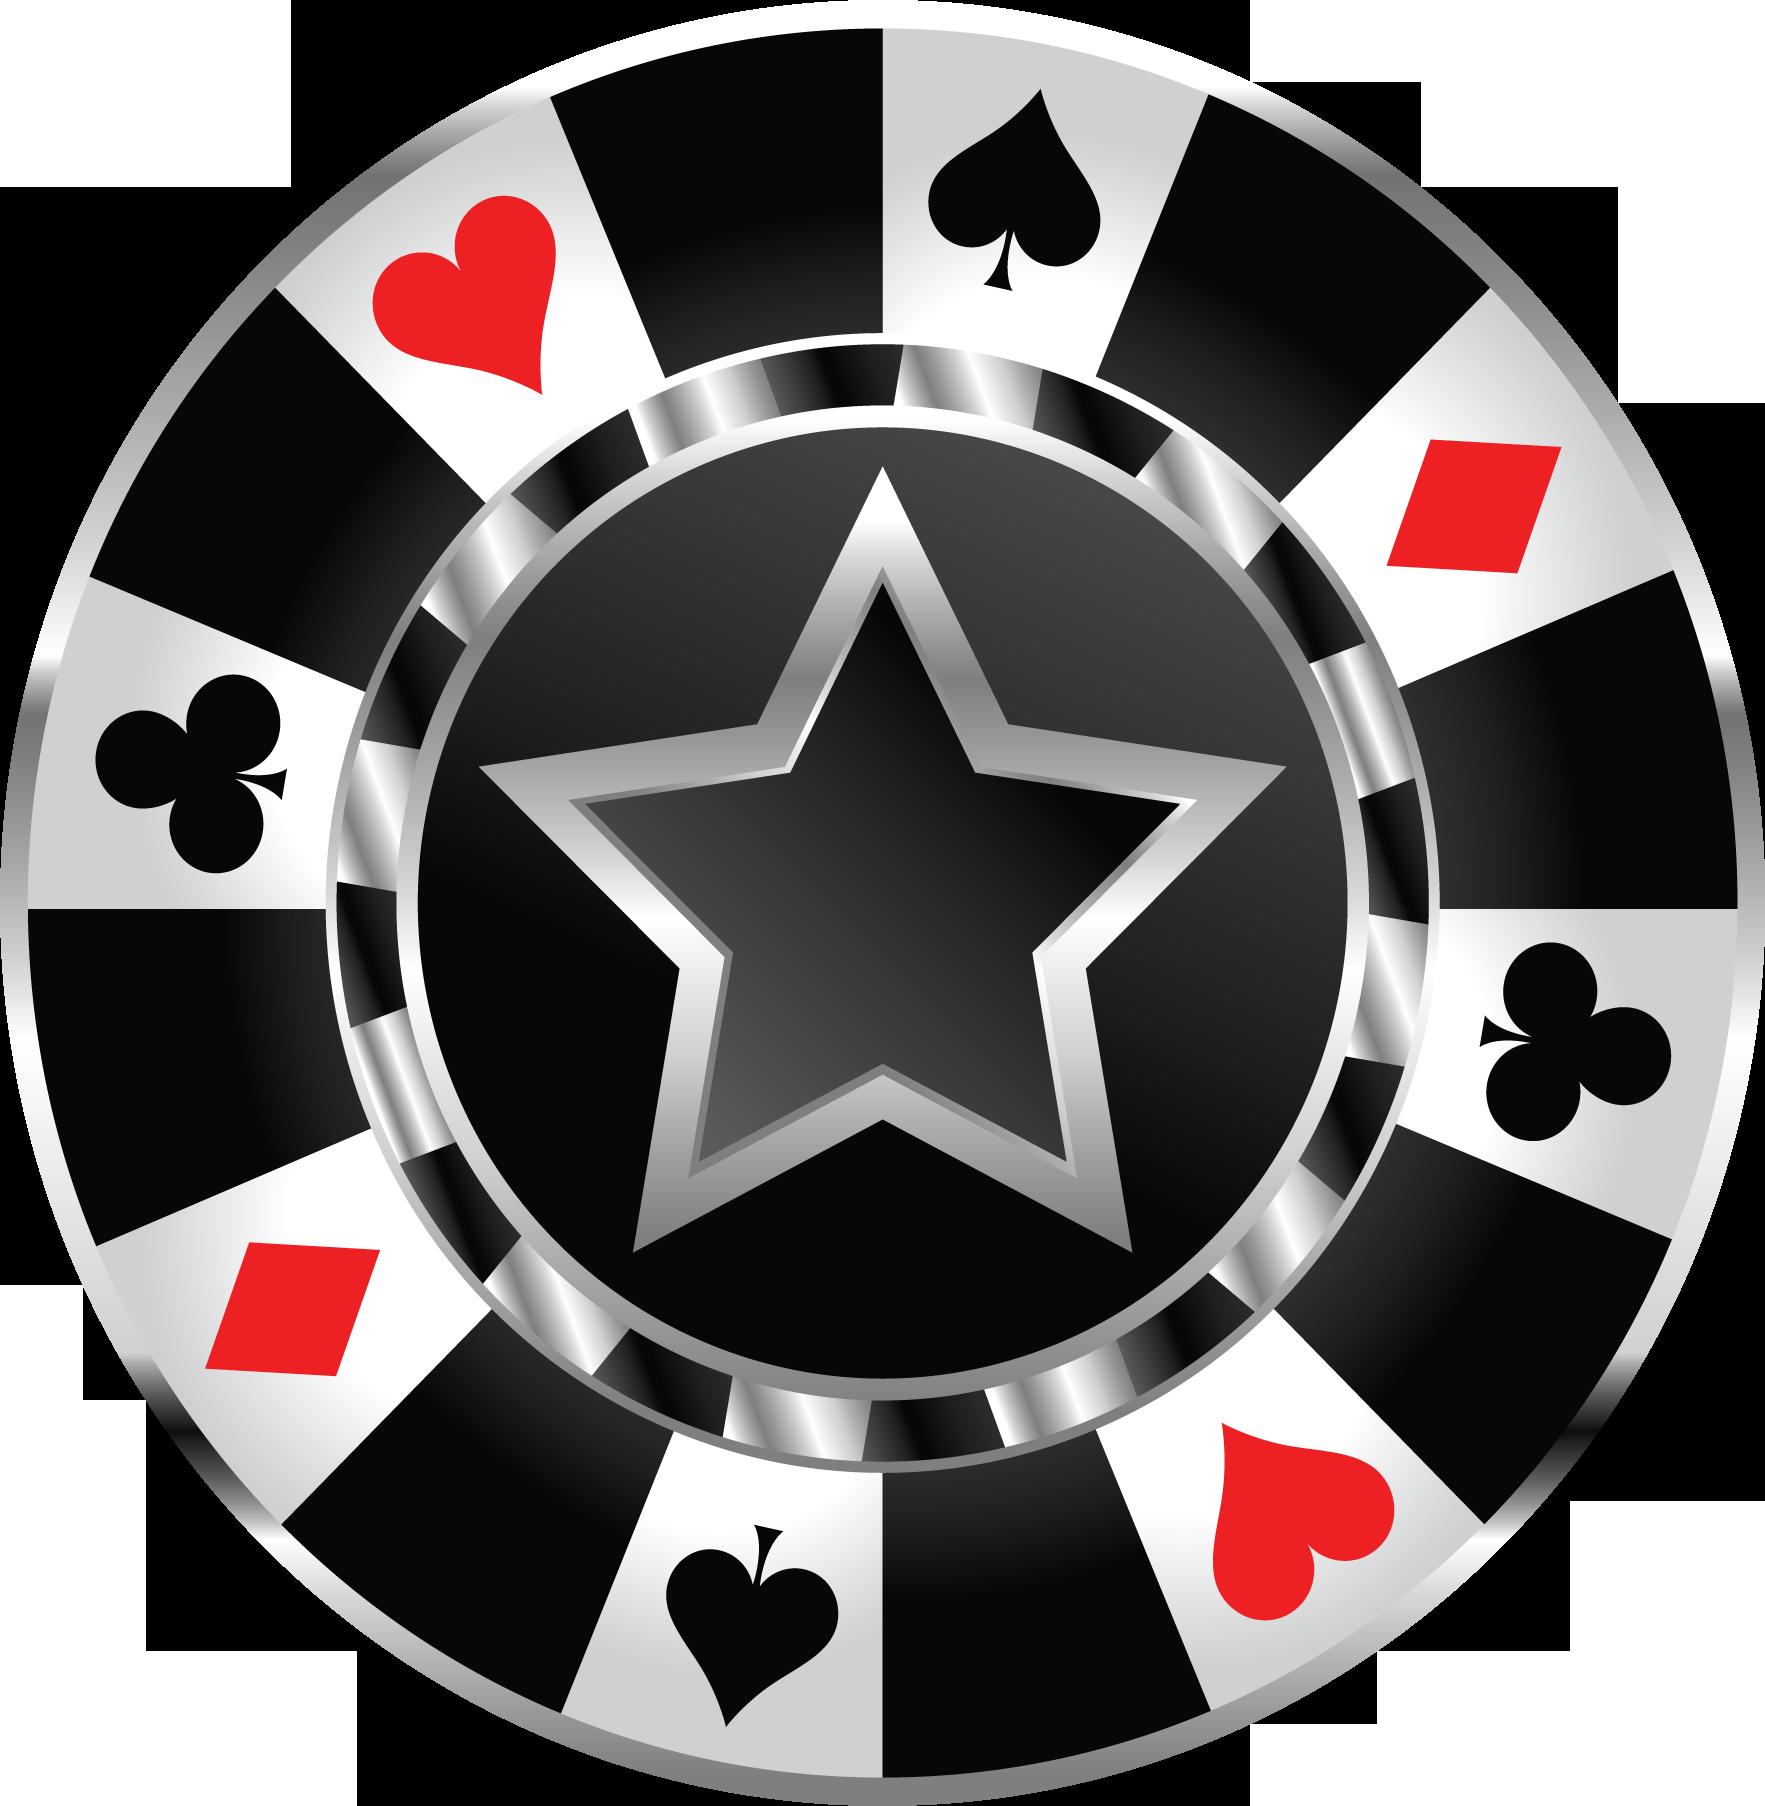 Poker Chips Png Image In 2021 Poker Chips Poker Dinners For Kids